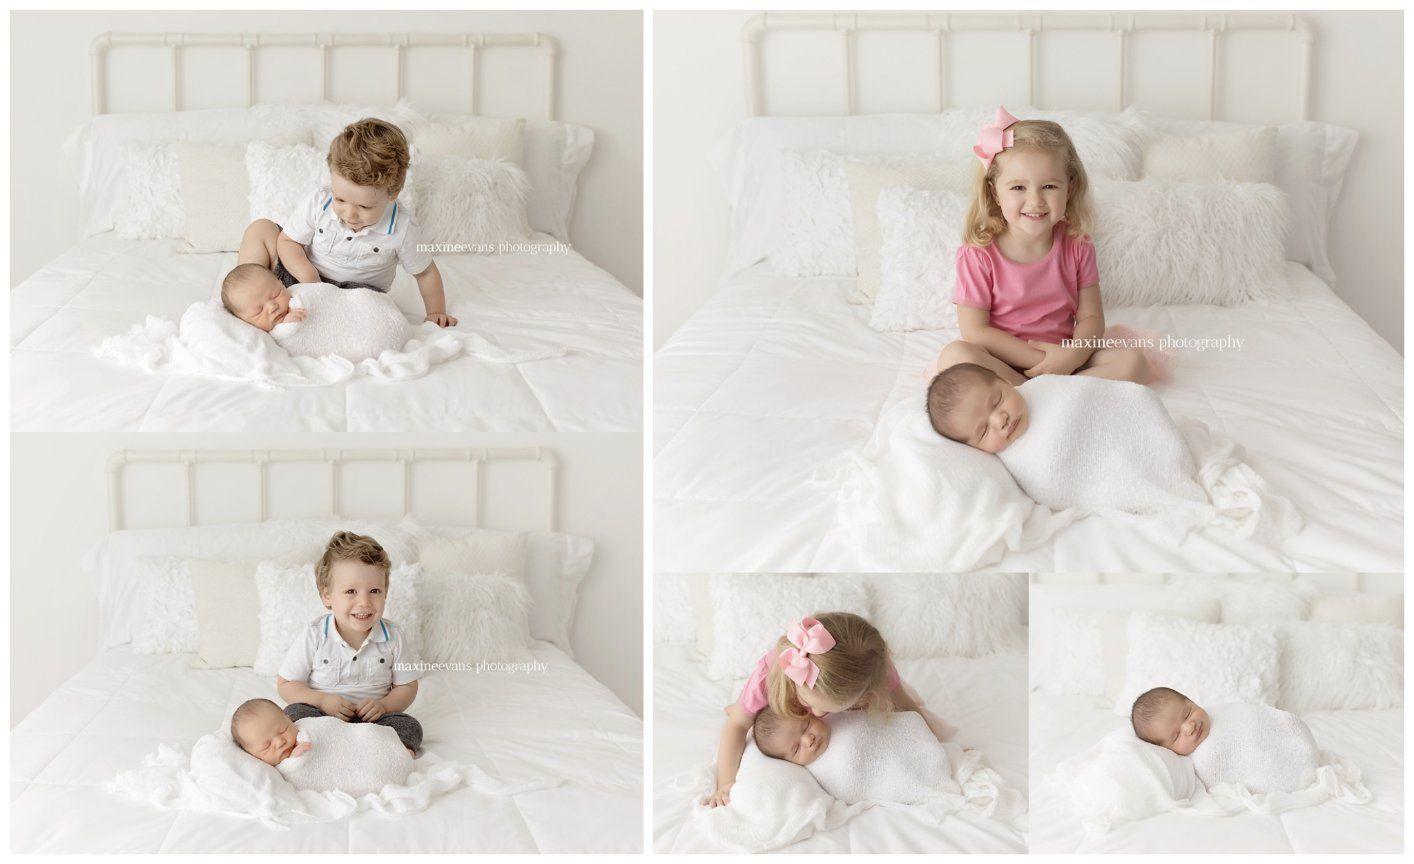 Los Angeles Newborn Baby Photography - Siblings! | Newborn ...